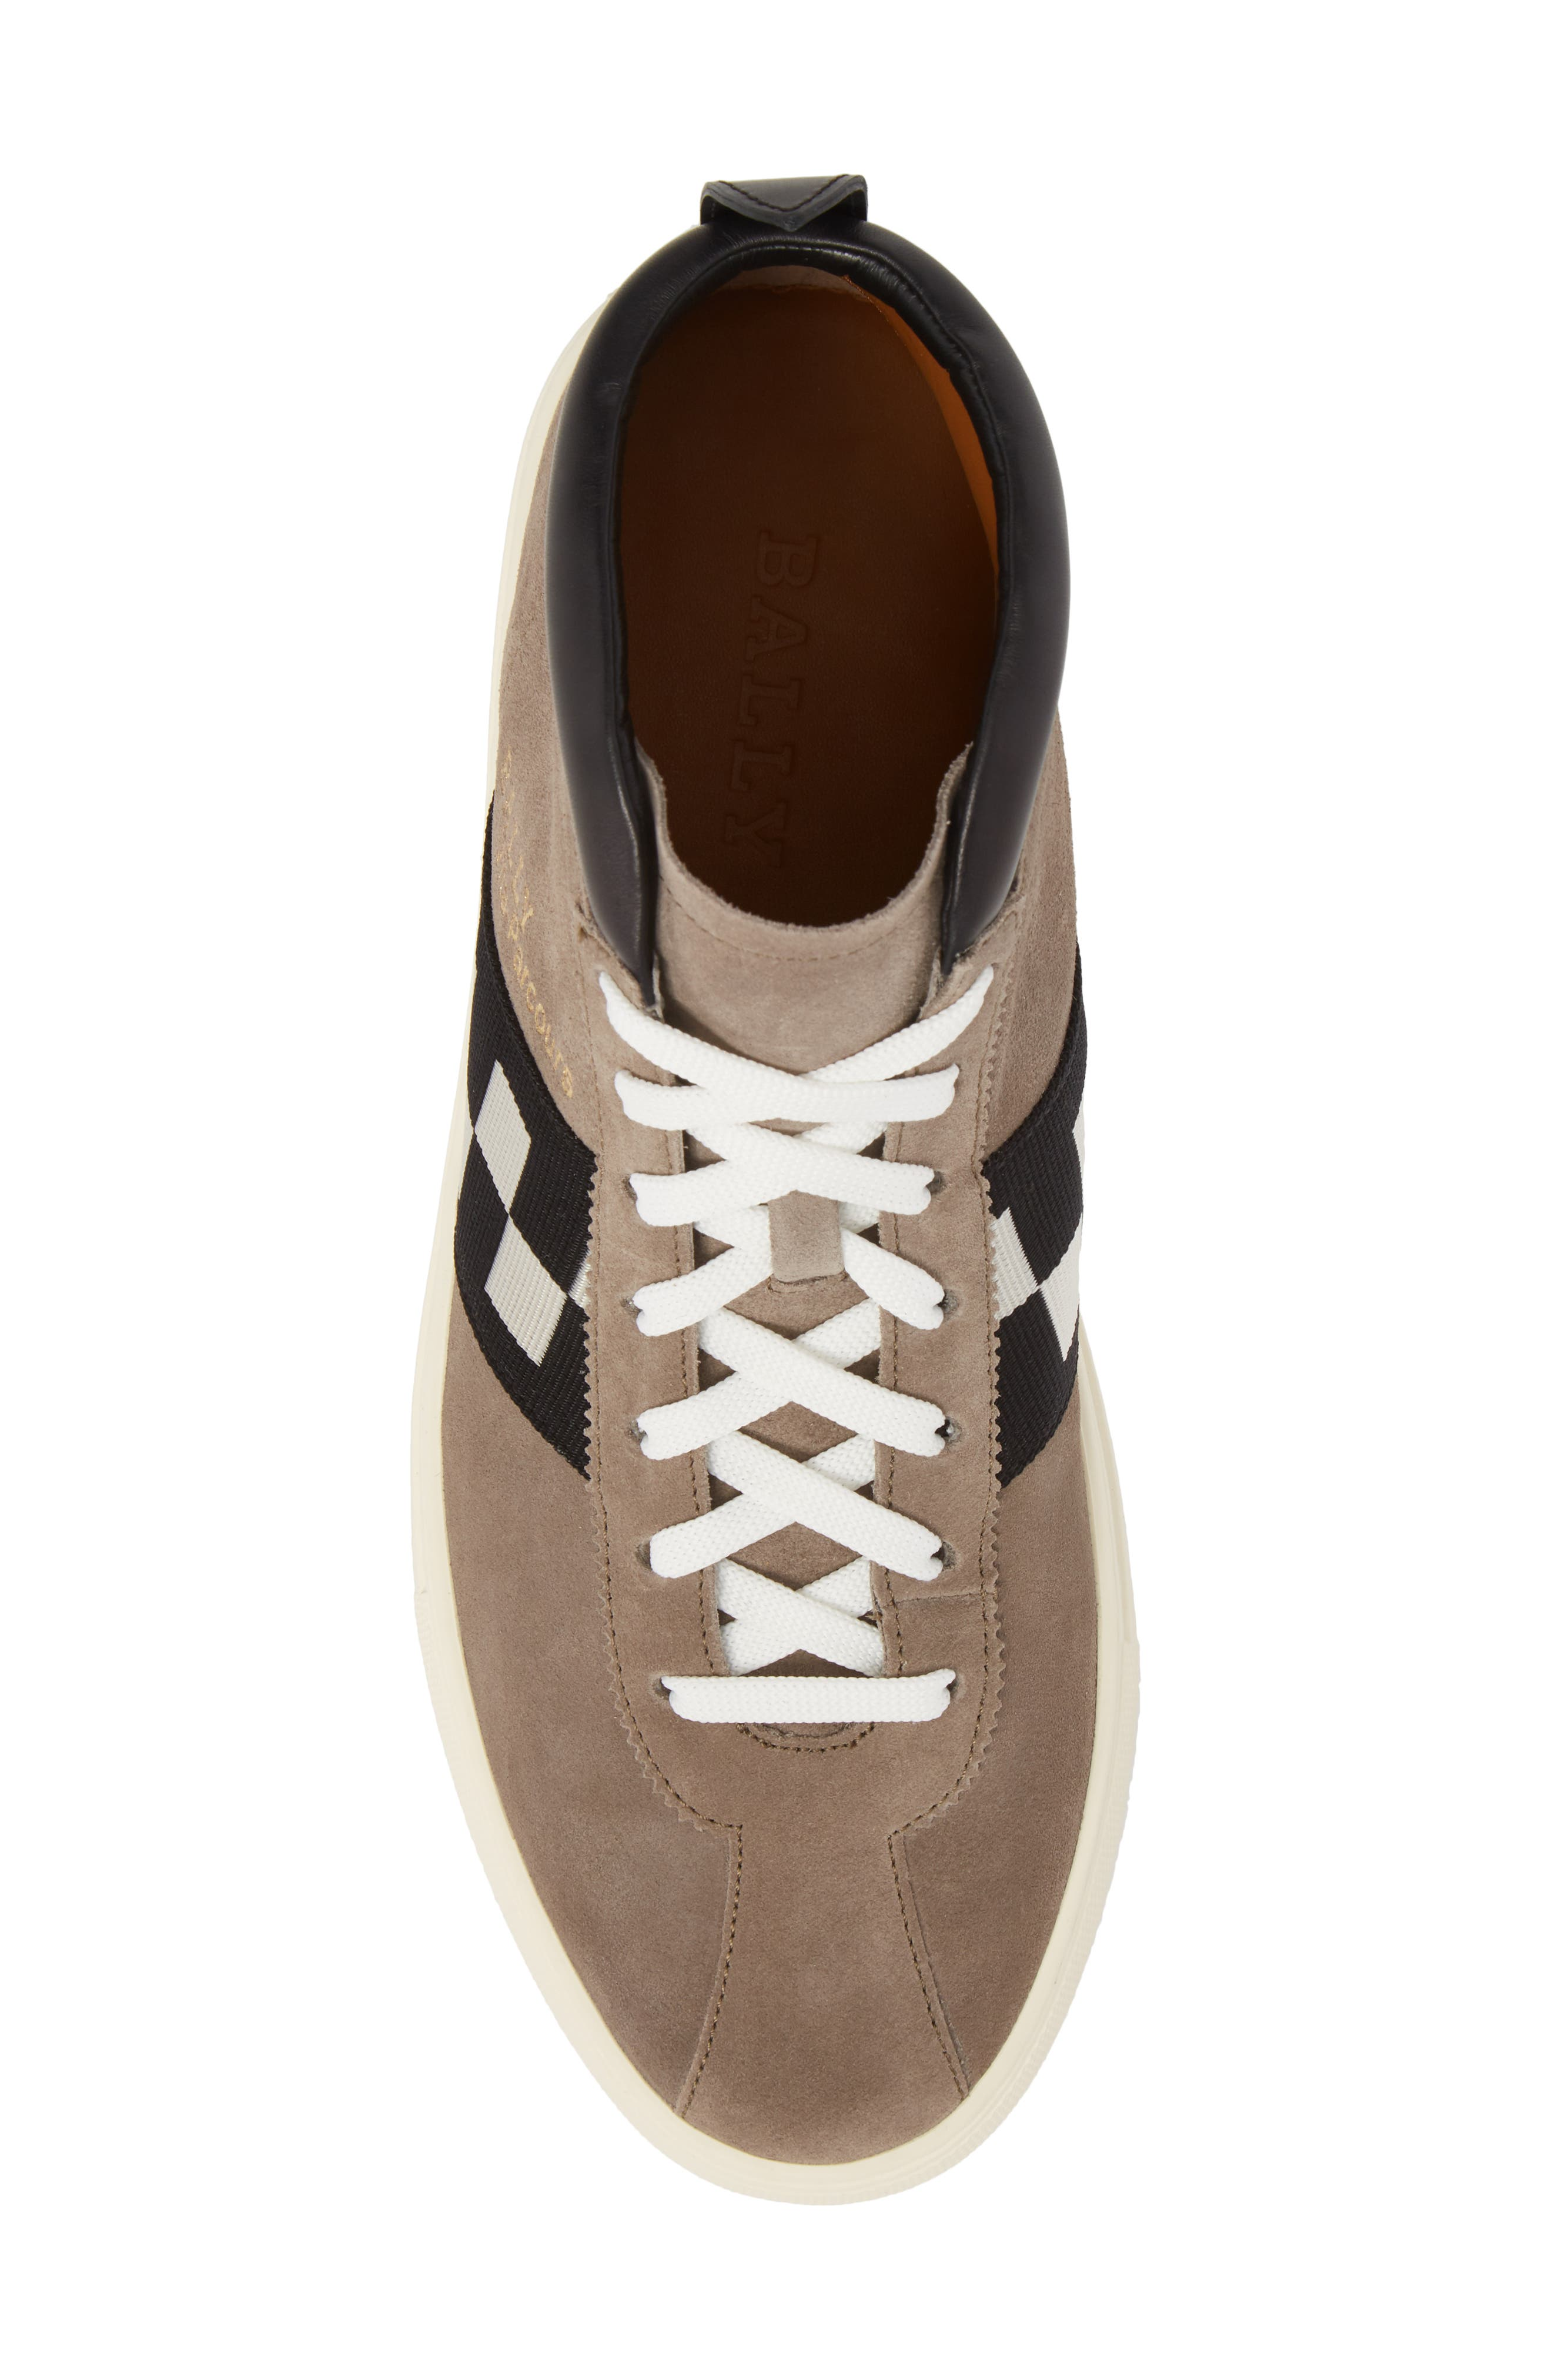 Vita Checkered High Top Sneaker,                             Alternate thumbnail 5, color,                             Snuff